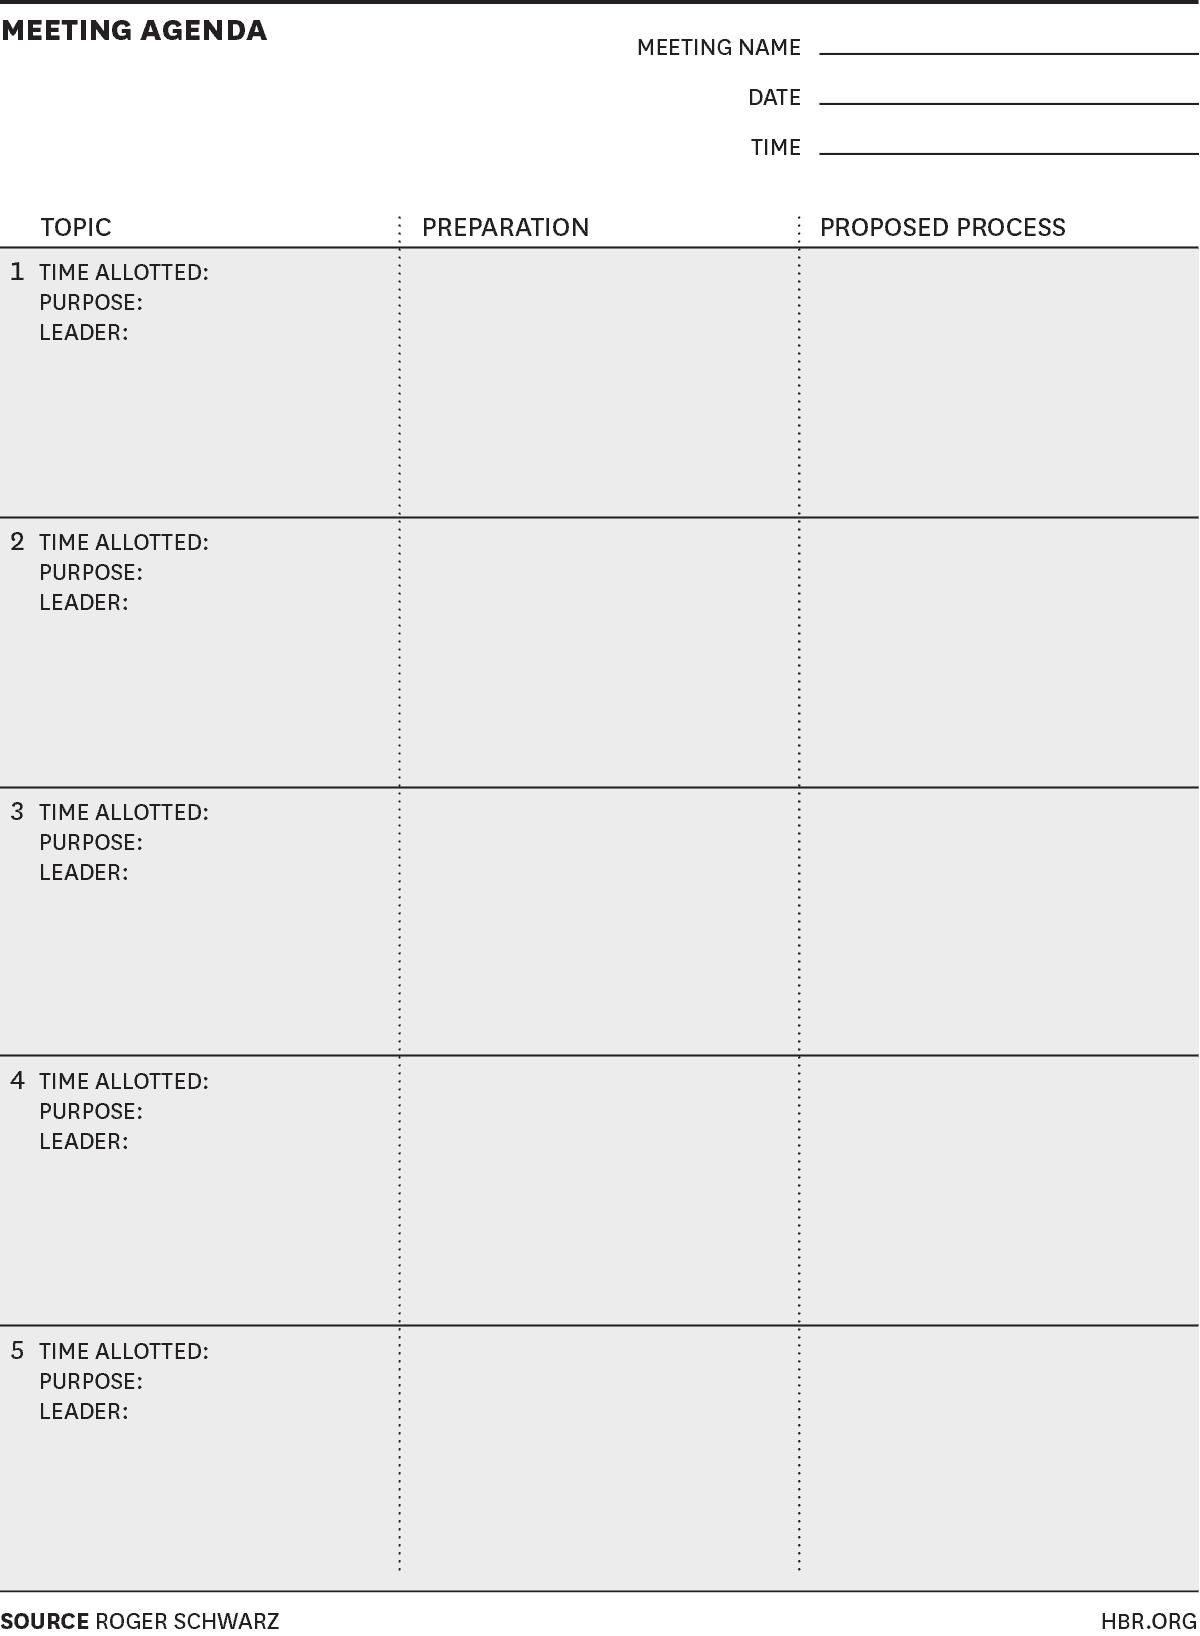 15 meeting agenda templates